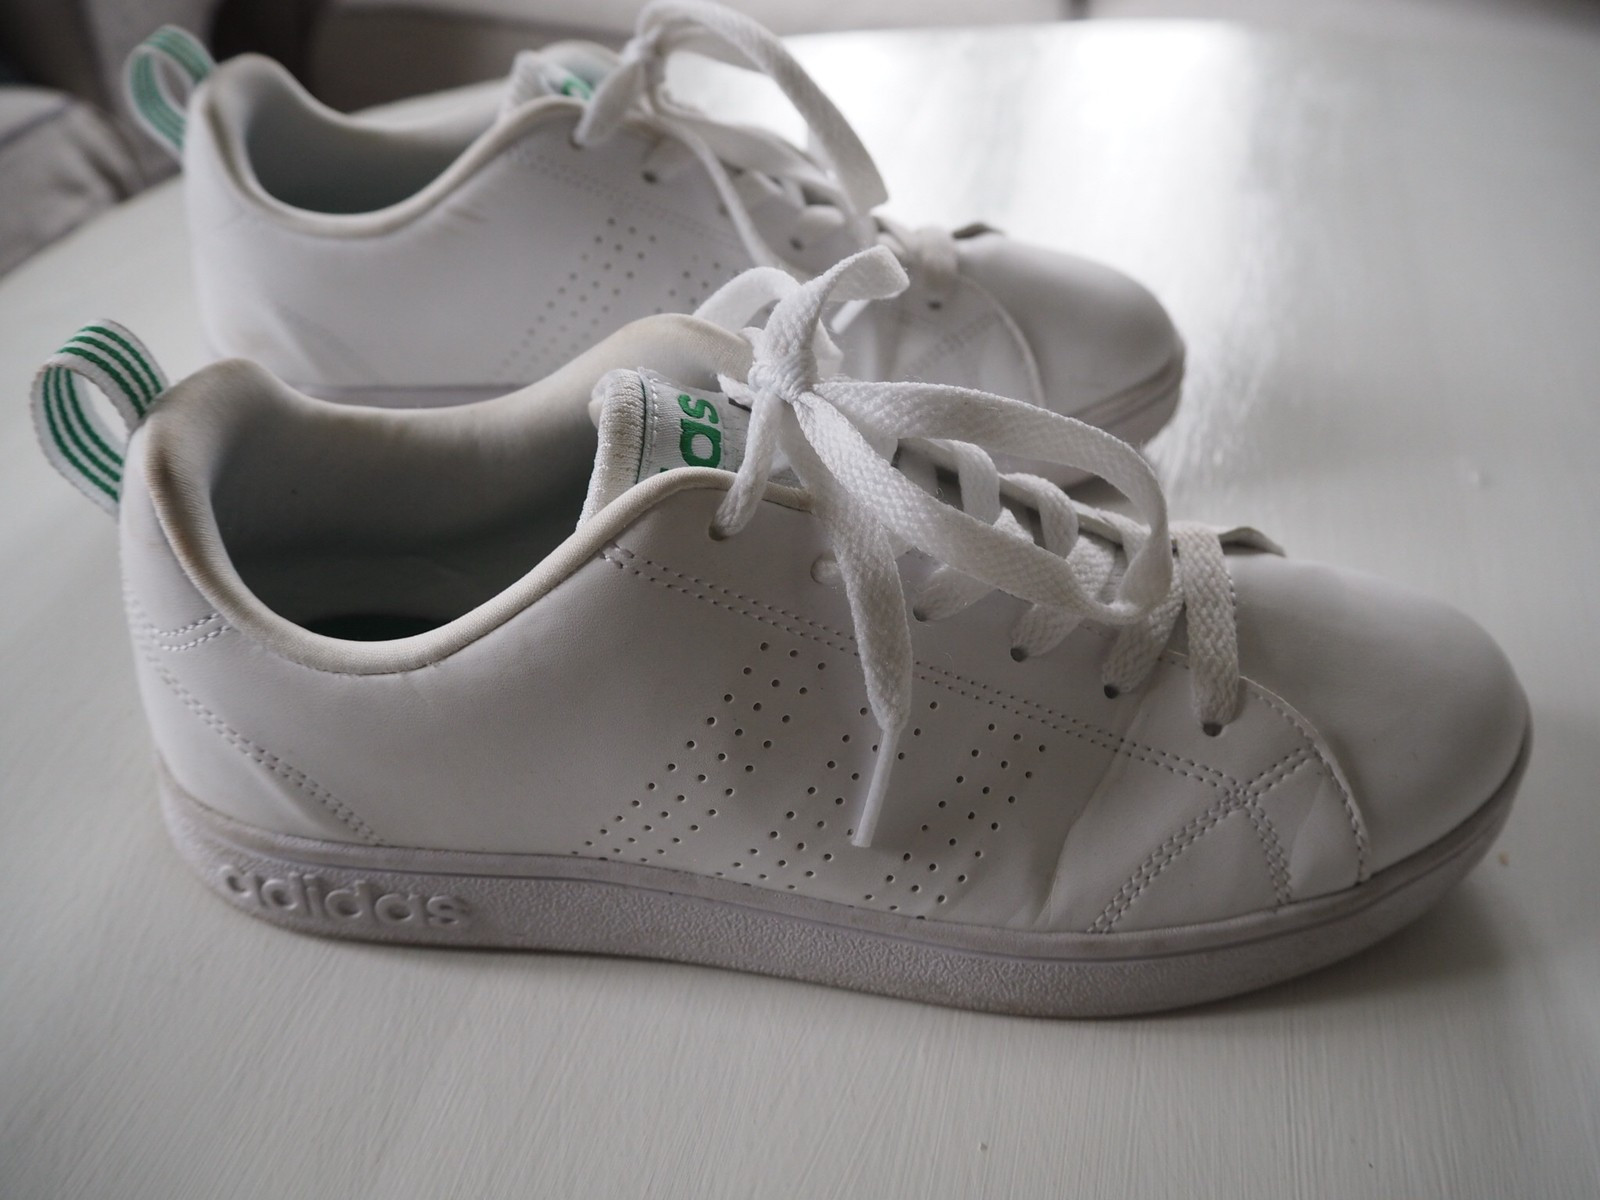 NYE Neo Label X Adidas sko med leopardprint | FINN.no